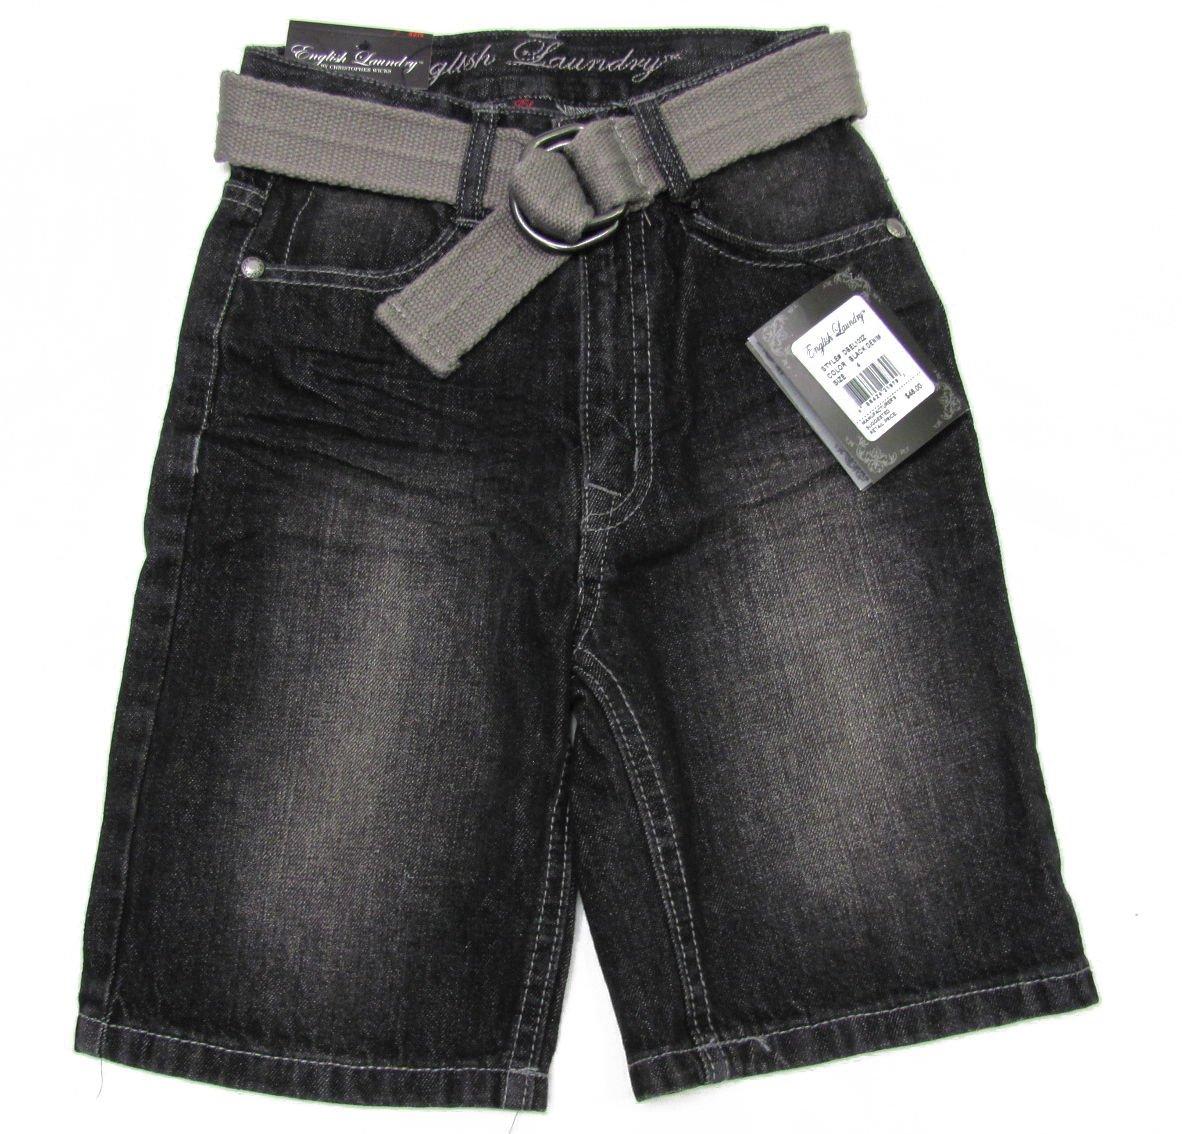 English Laundry Boys size 4 Black Jean Shorts with Belt New